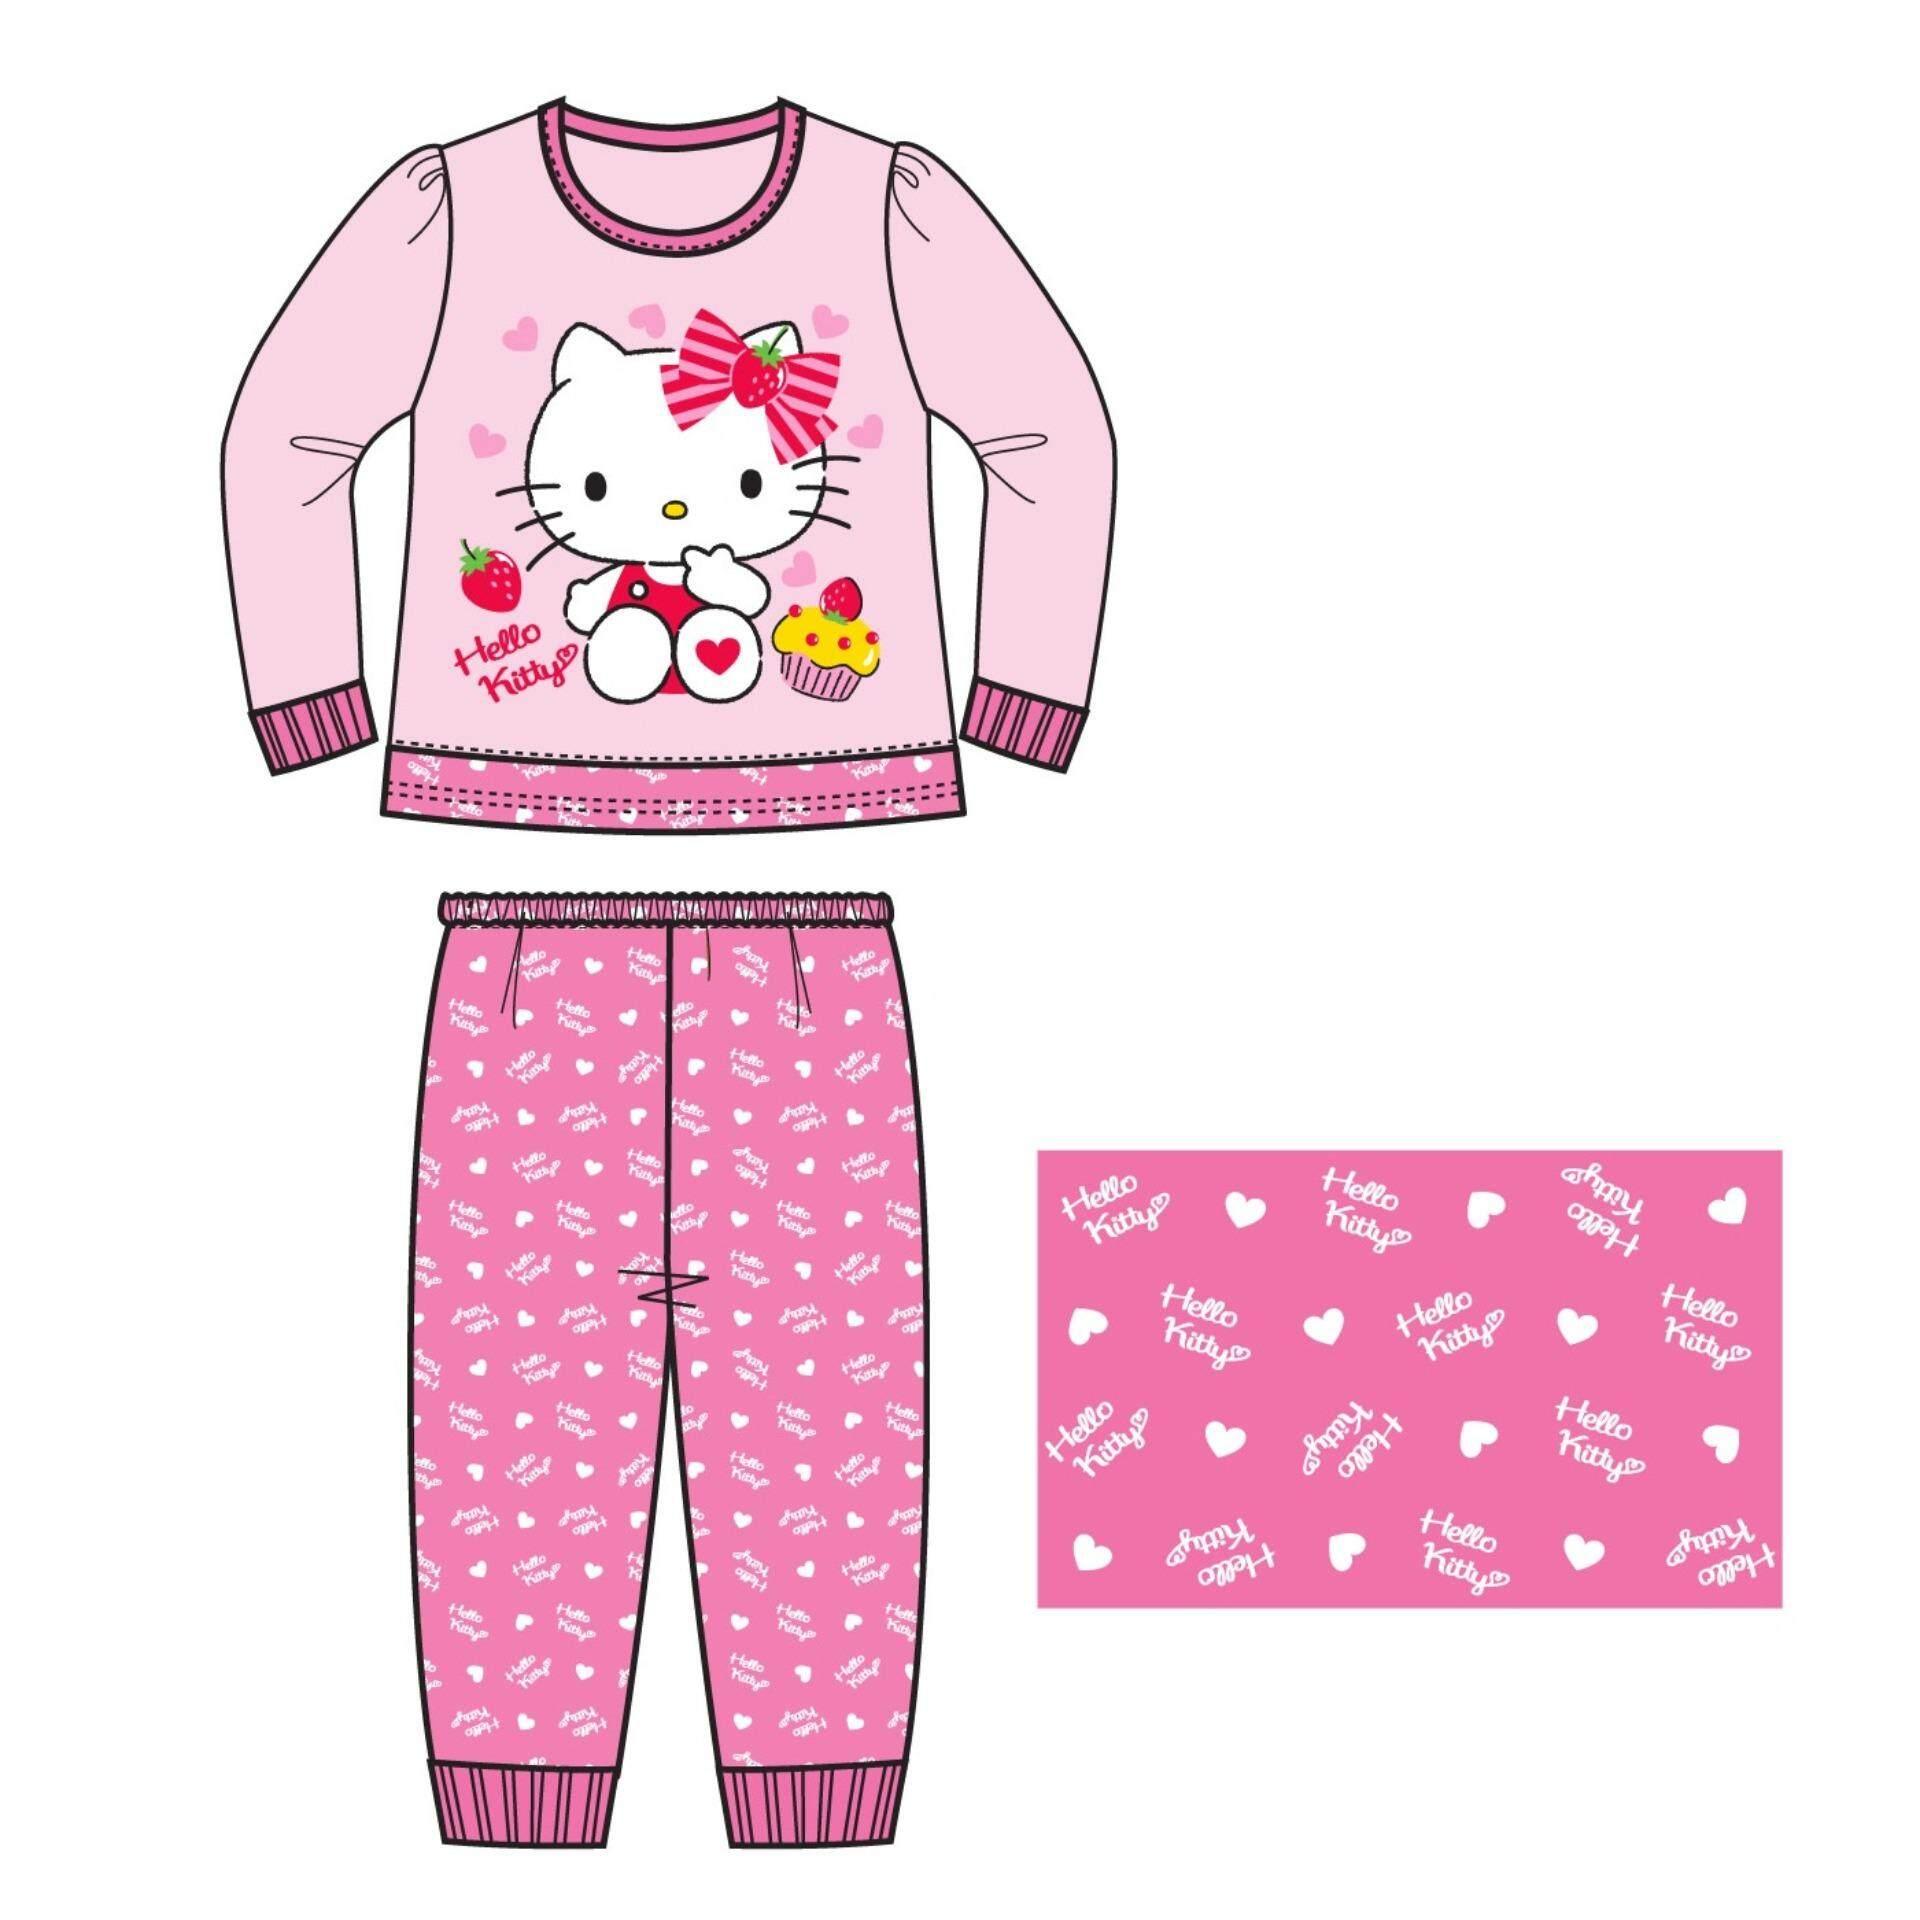 Sanrio Hello Kitty Children Kids Homewear For Age 5yrs To 12yrs 100% Cotton - Pink